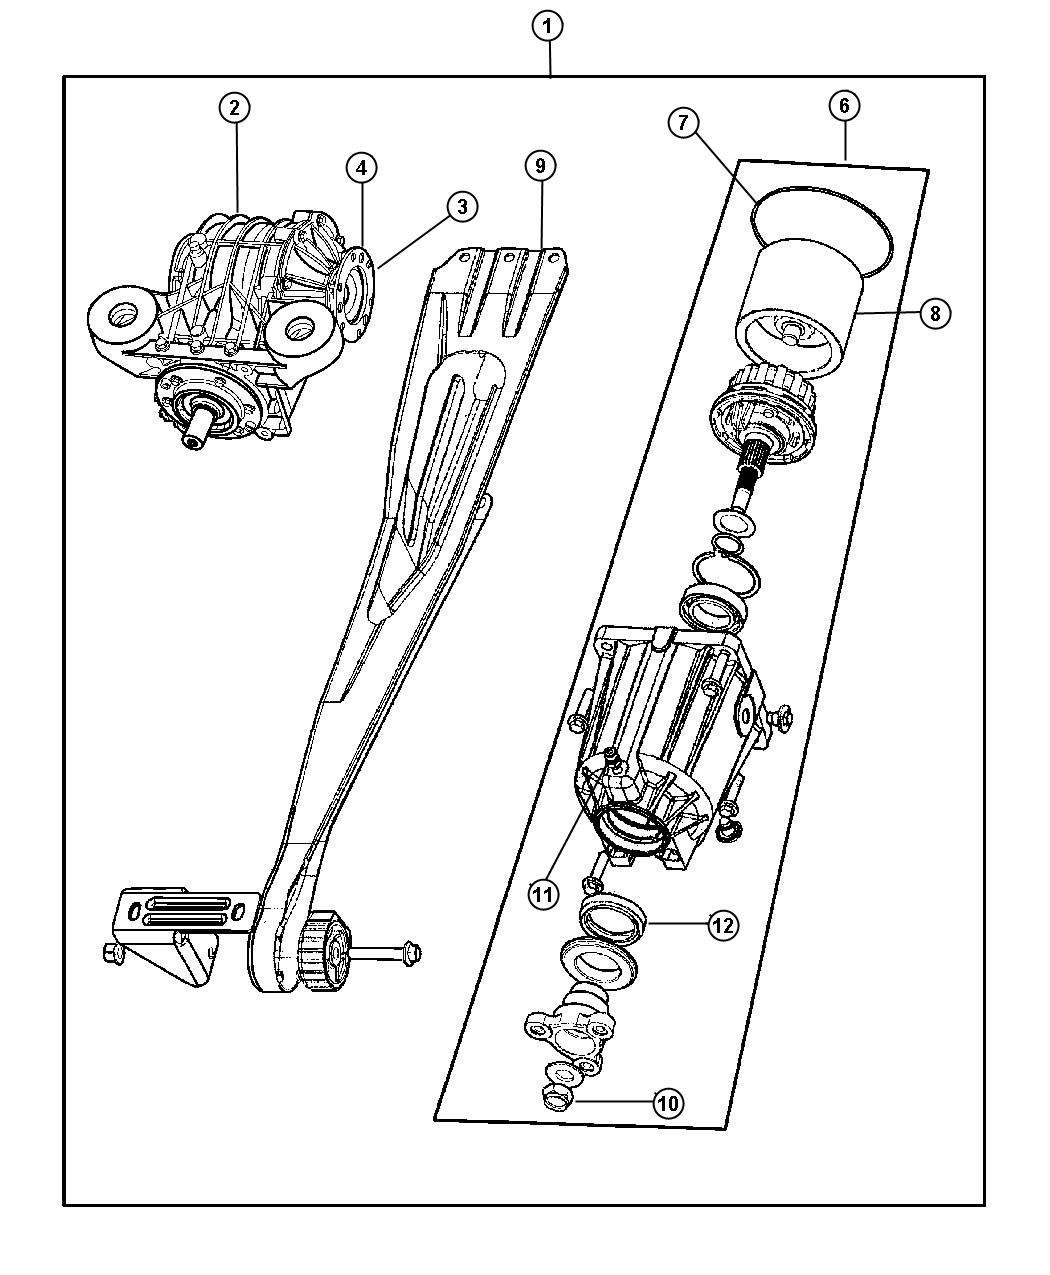 Dodge Caravan Viscous coupling. Rearall, differentialrear